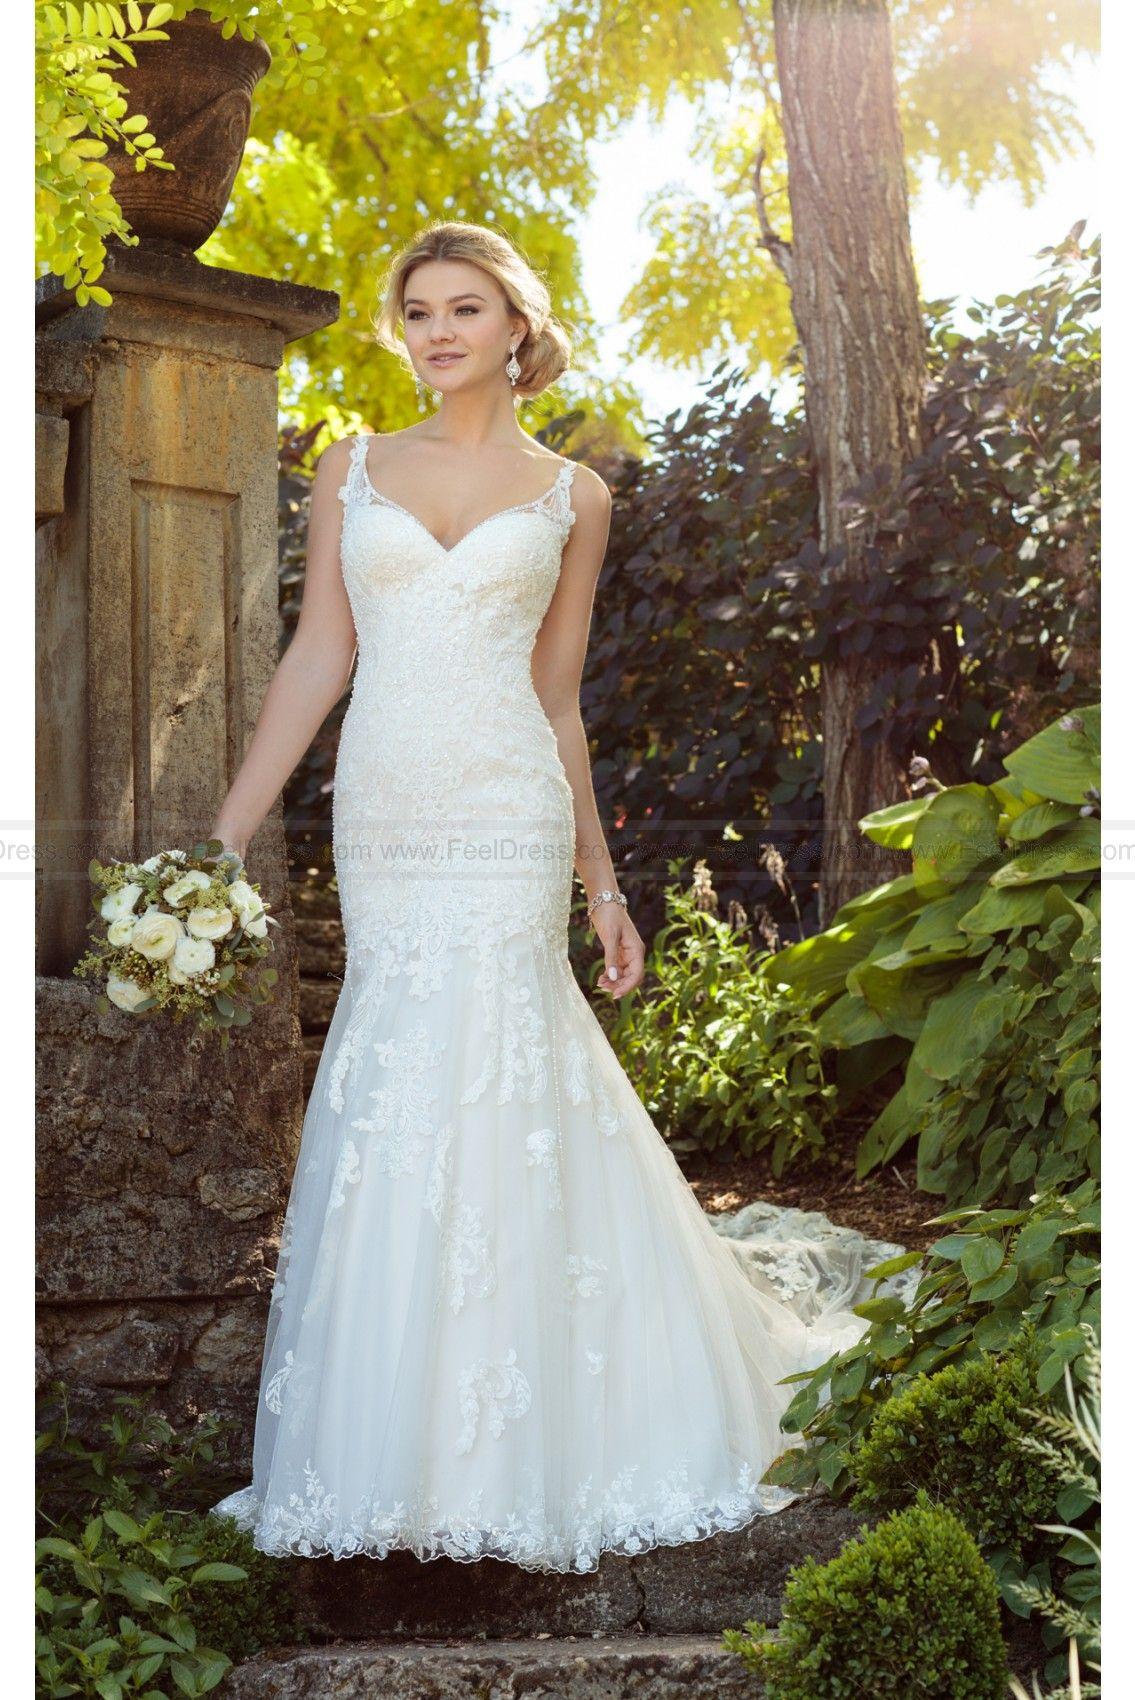 Essense of Australia Vintage Boho Wedding Dress With Pearl